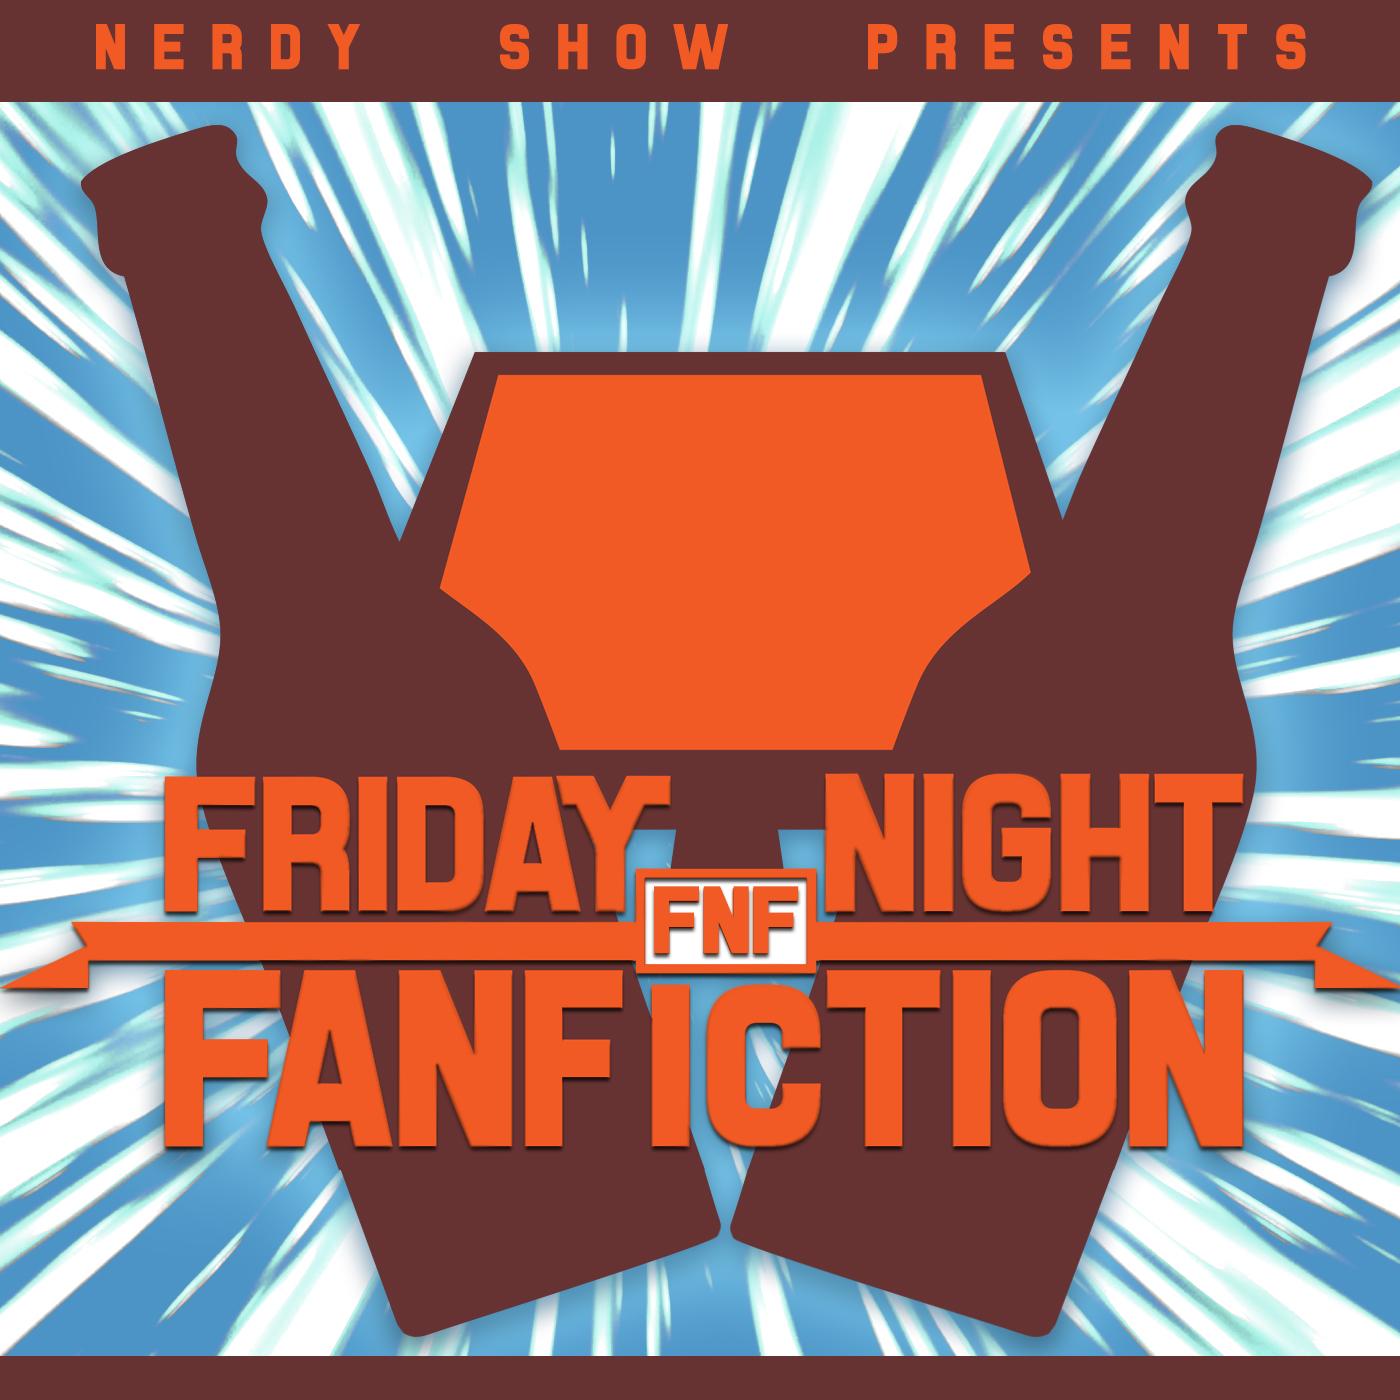 Friday Night Fanfiction